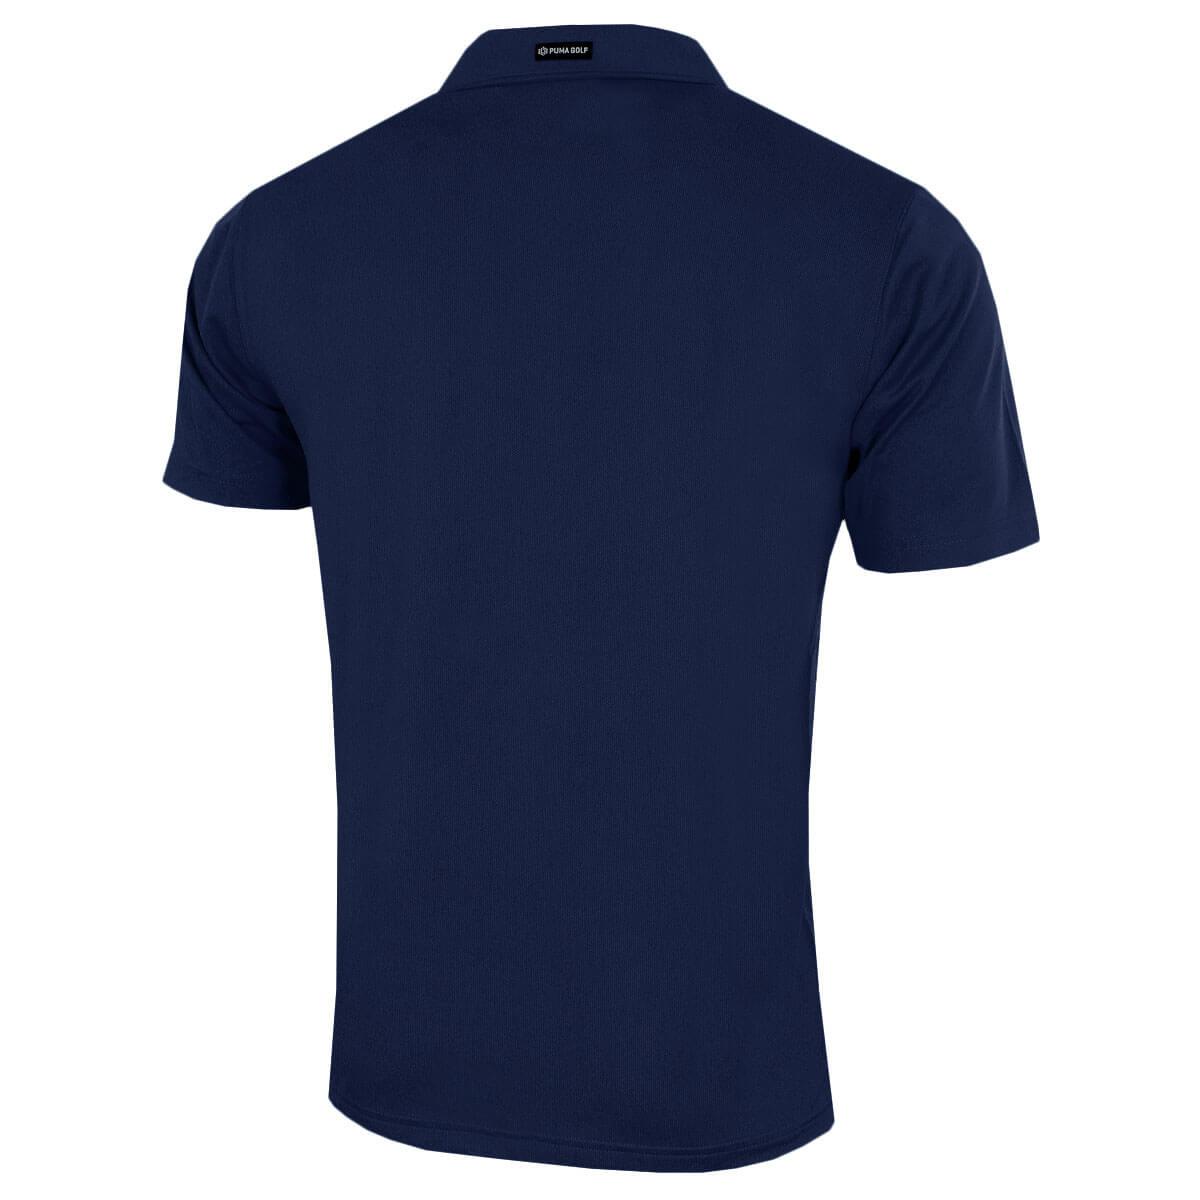 Puma-Golf-Mens-Essential-Pounce-Cresting-DryCell-Tech-Polo-Shirt-46-OFF-RRP thumbnail 17